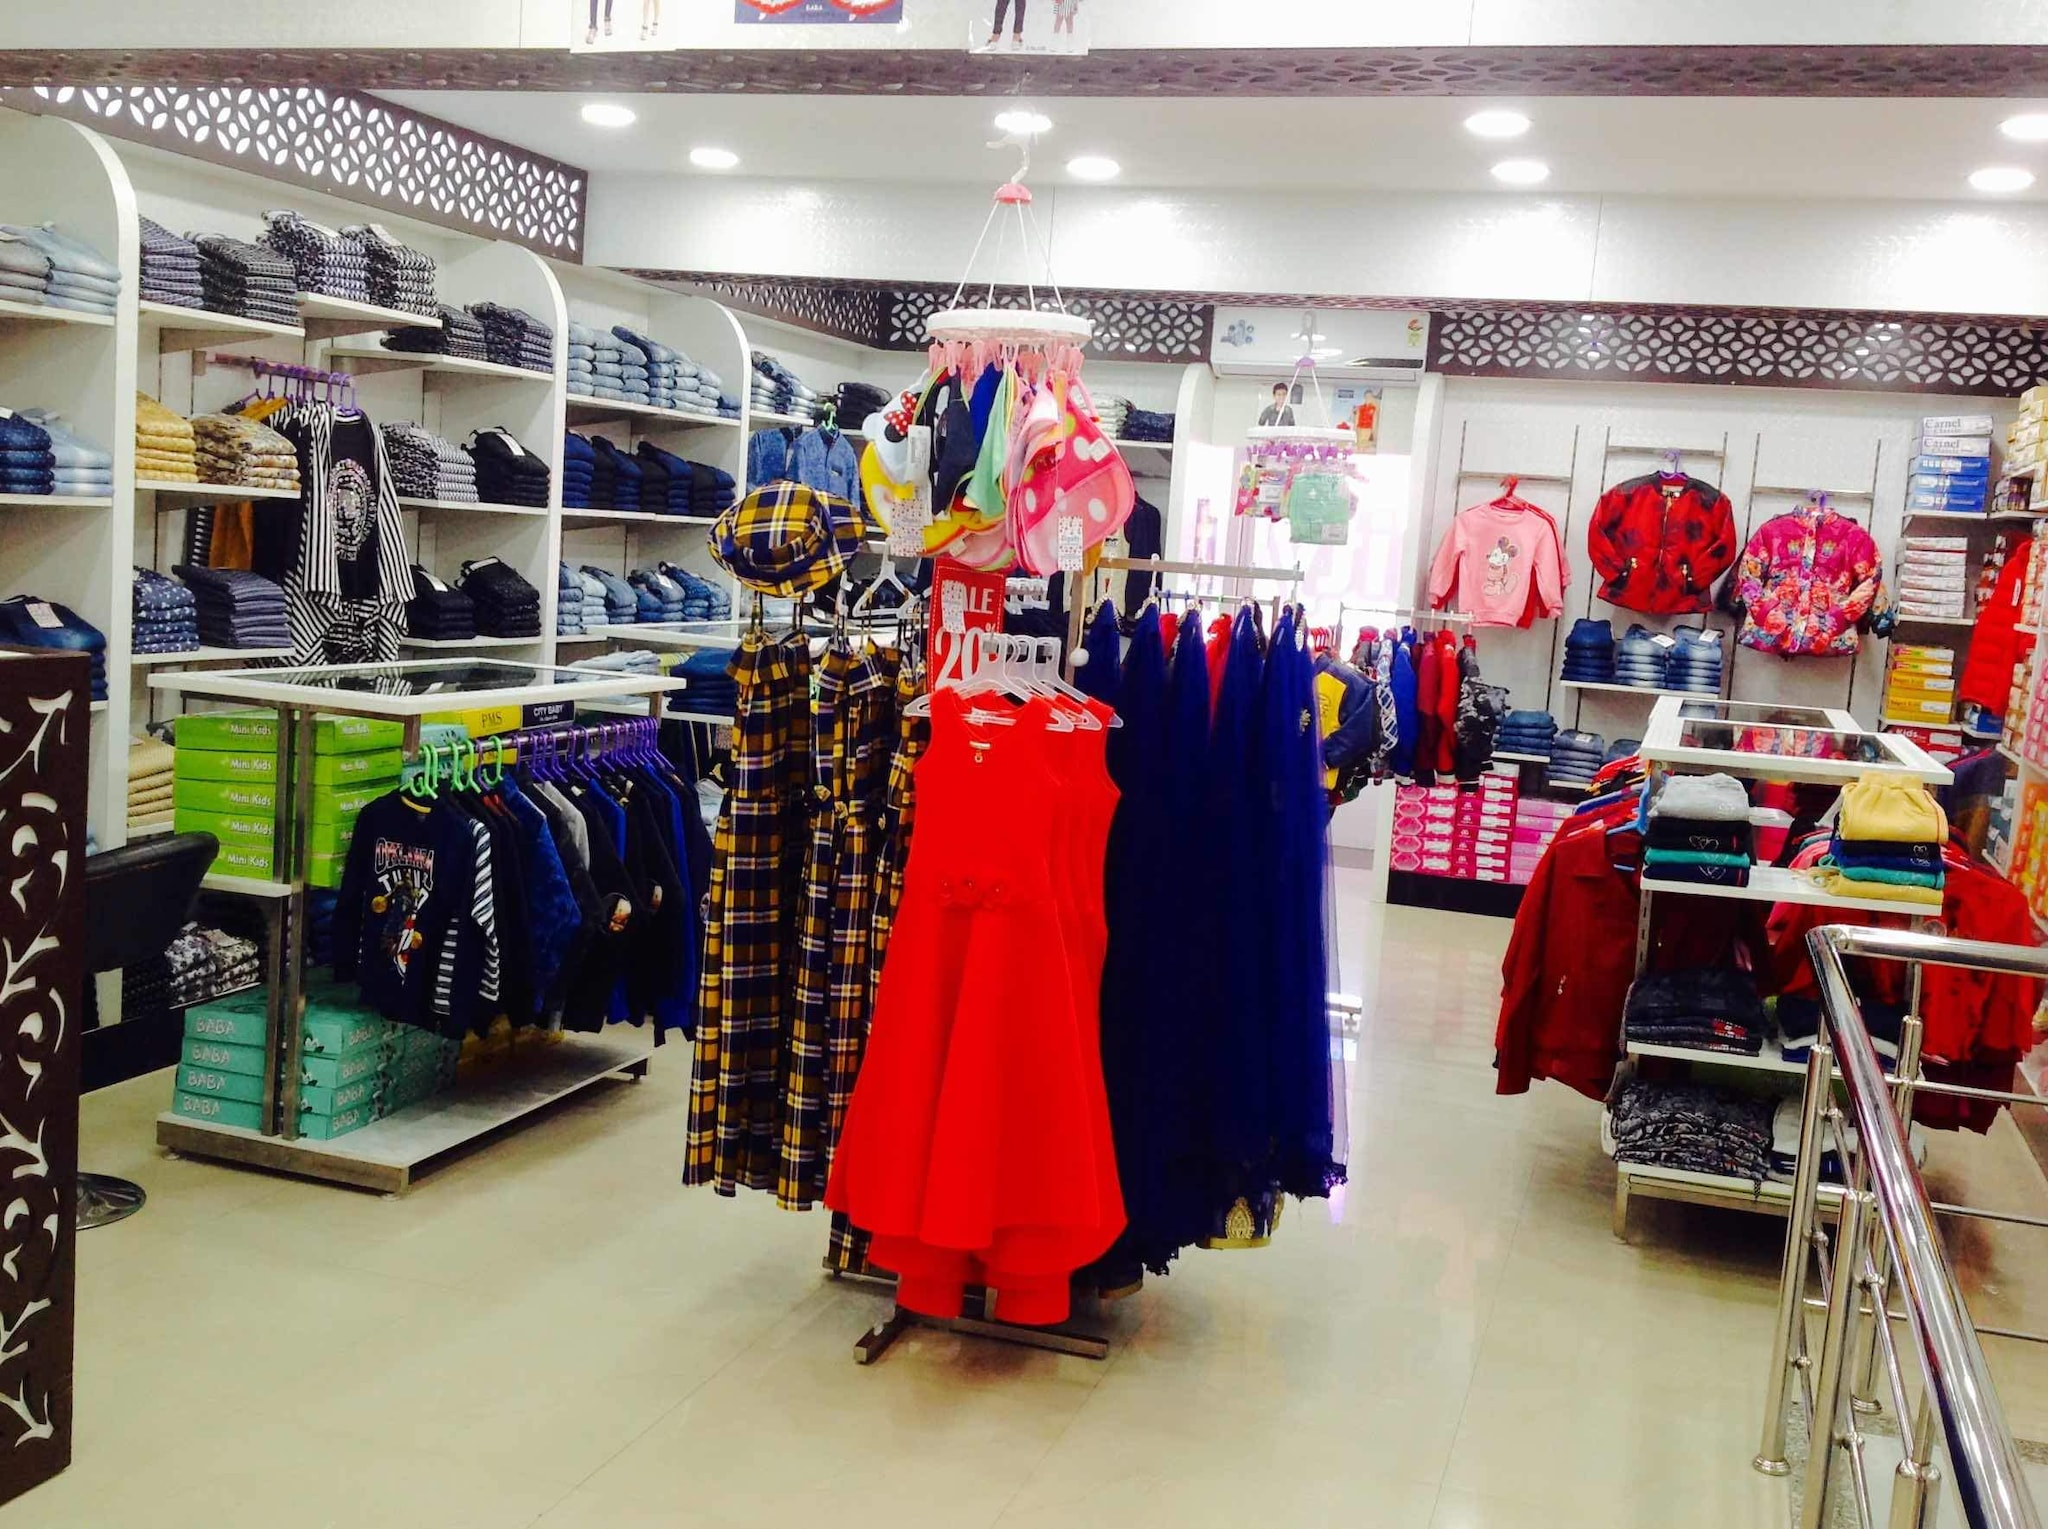 bd80b5e04a8 Top 100 Gents Readymade Garment Retailers in Dehradun - Best ...